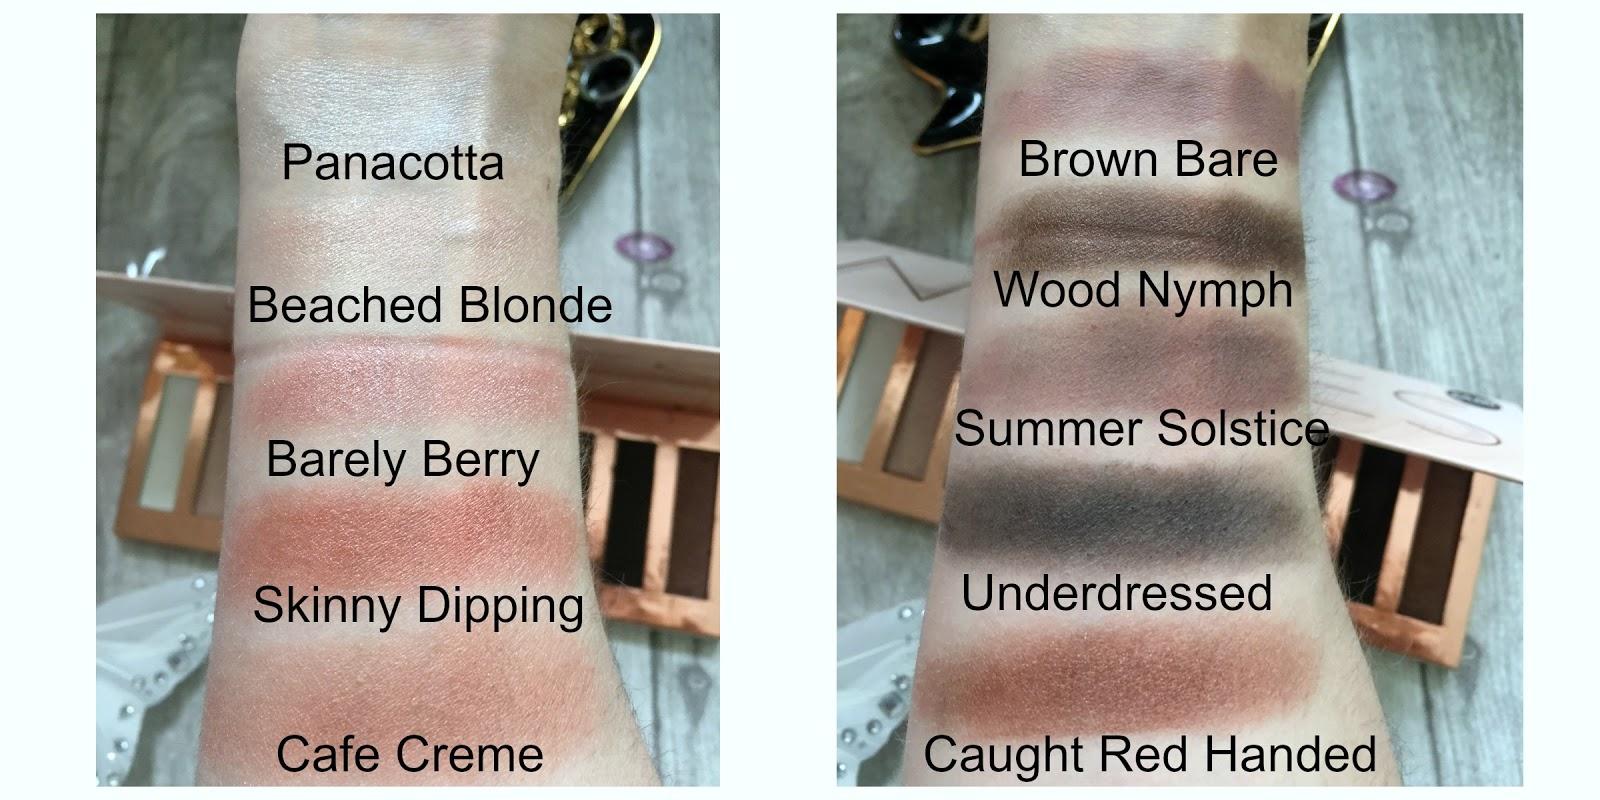 primark ps nudes eyeshadow palette swatches